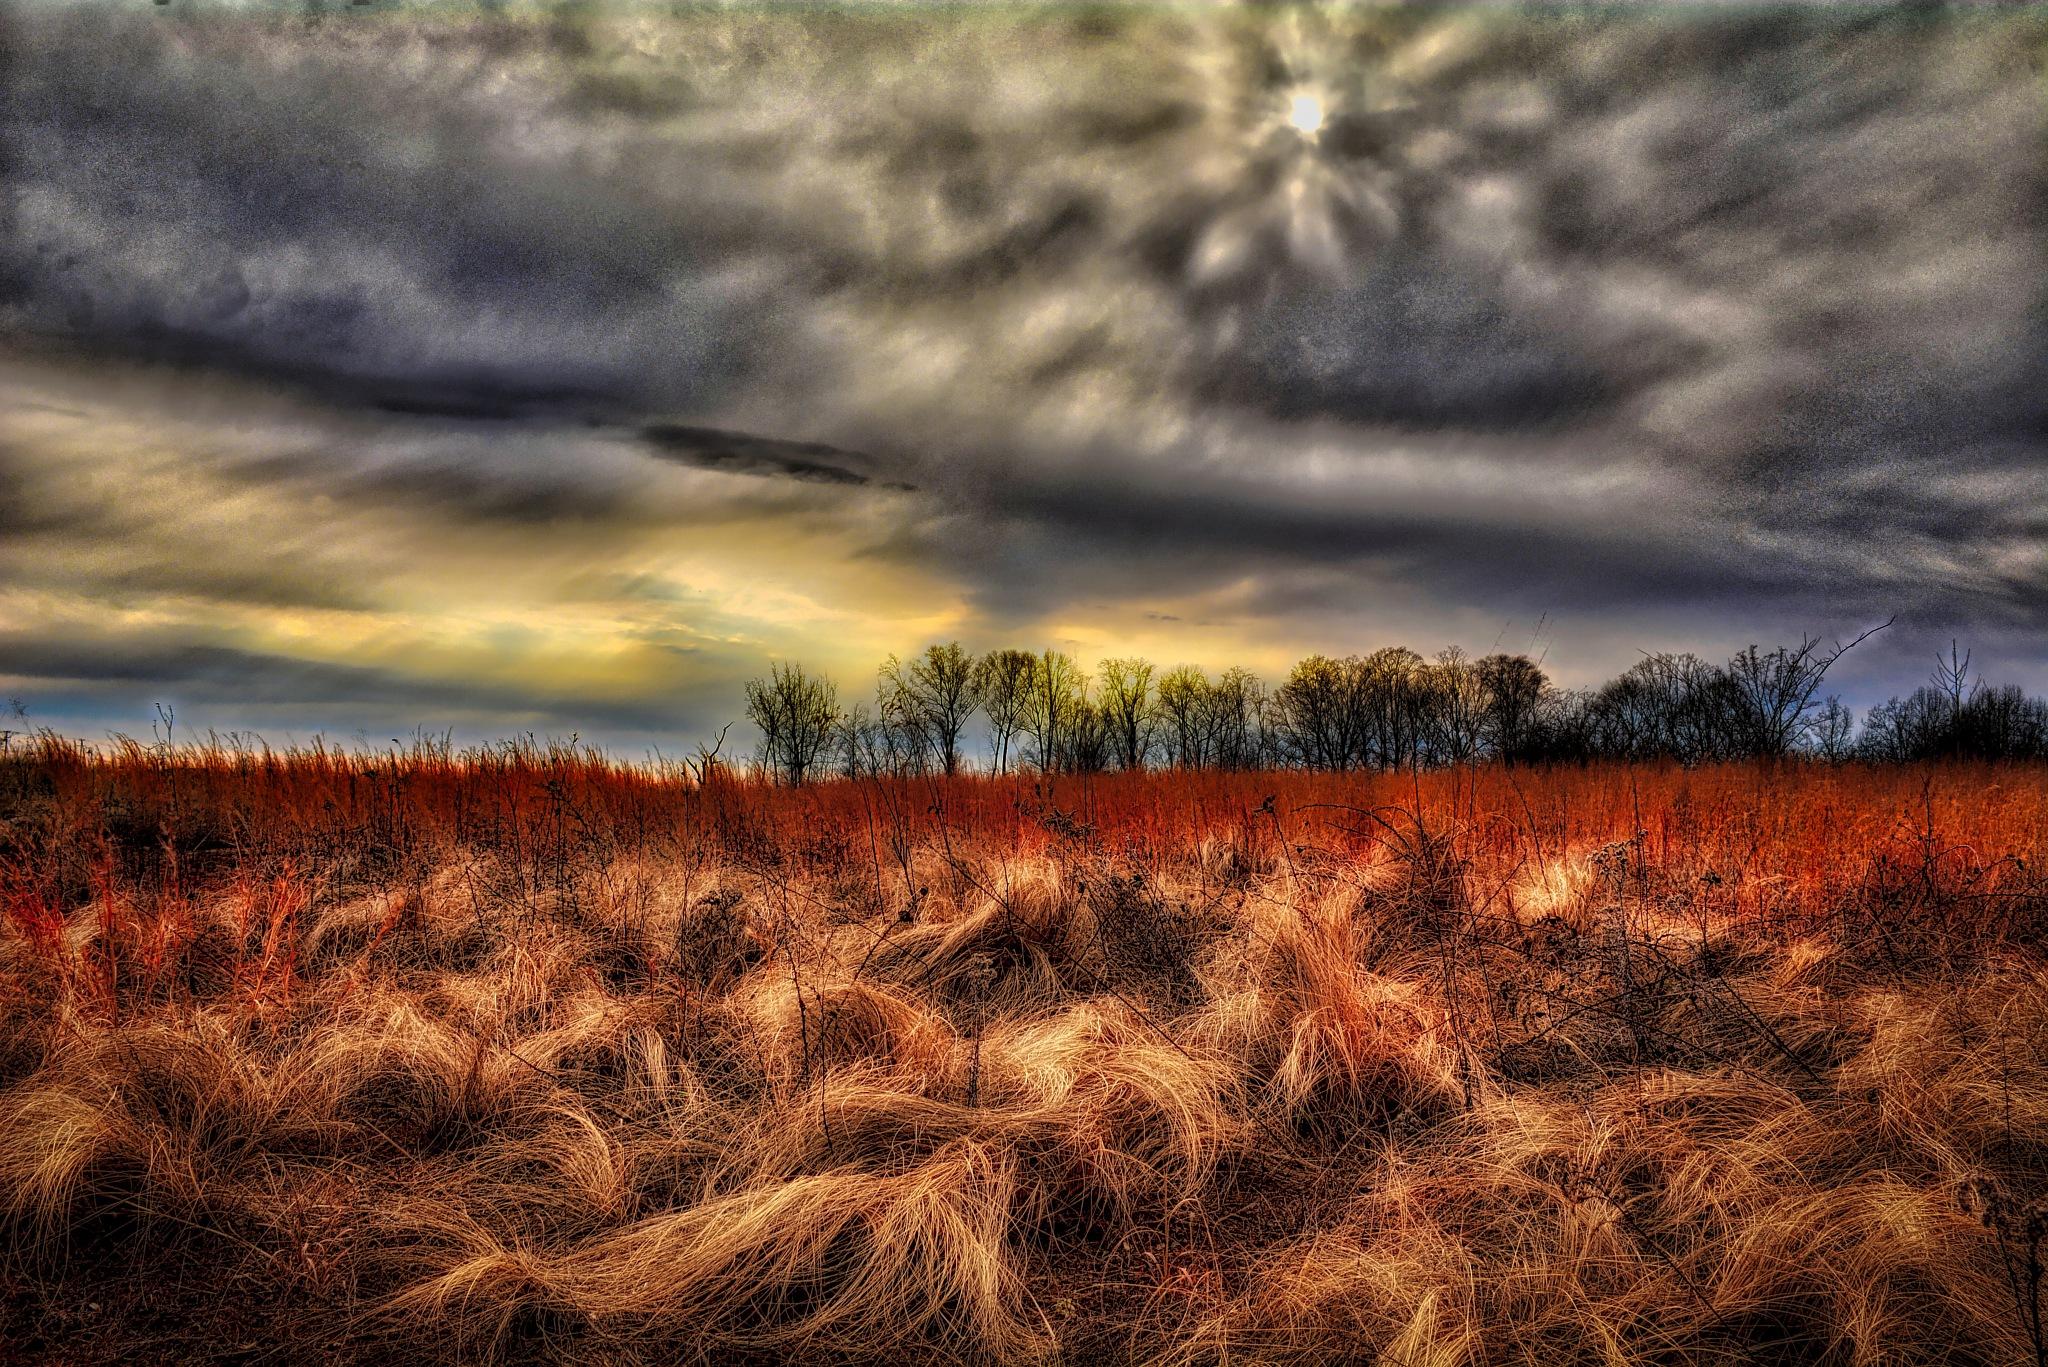 """Warm Winter Day"" by Michael  C. Habina"